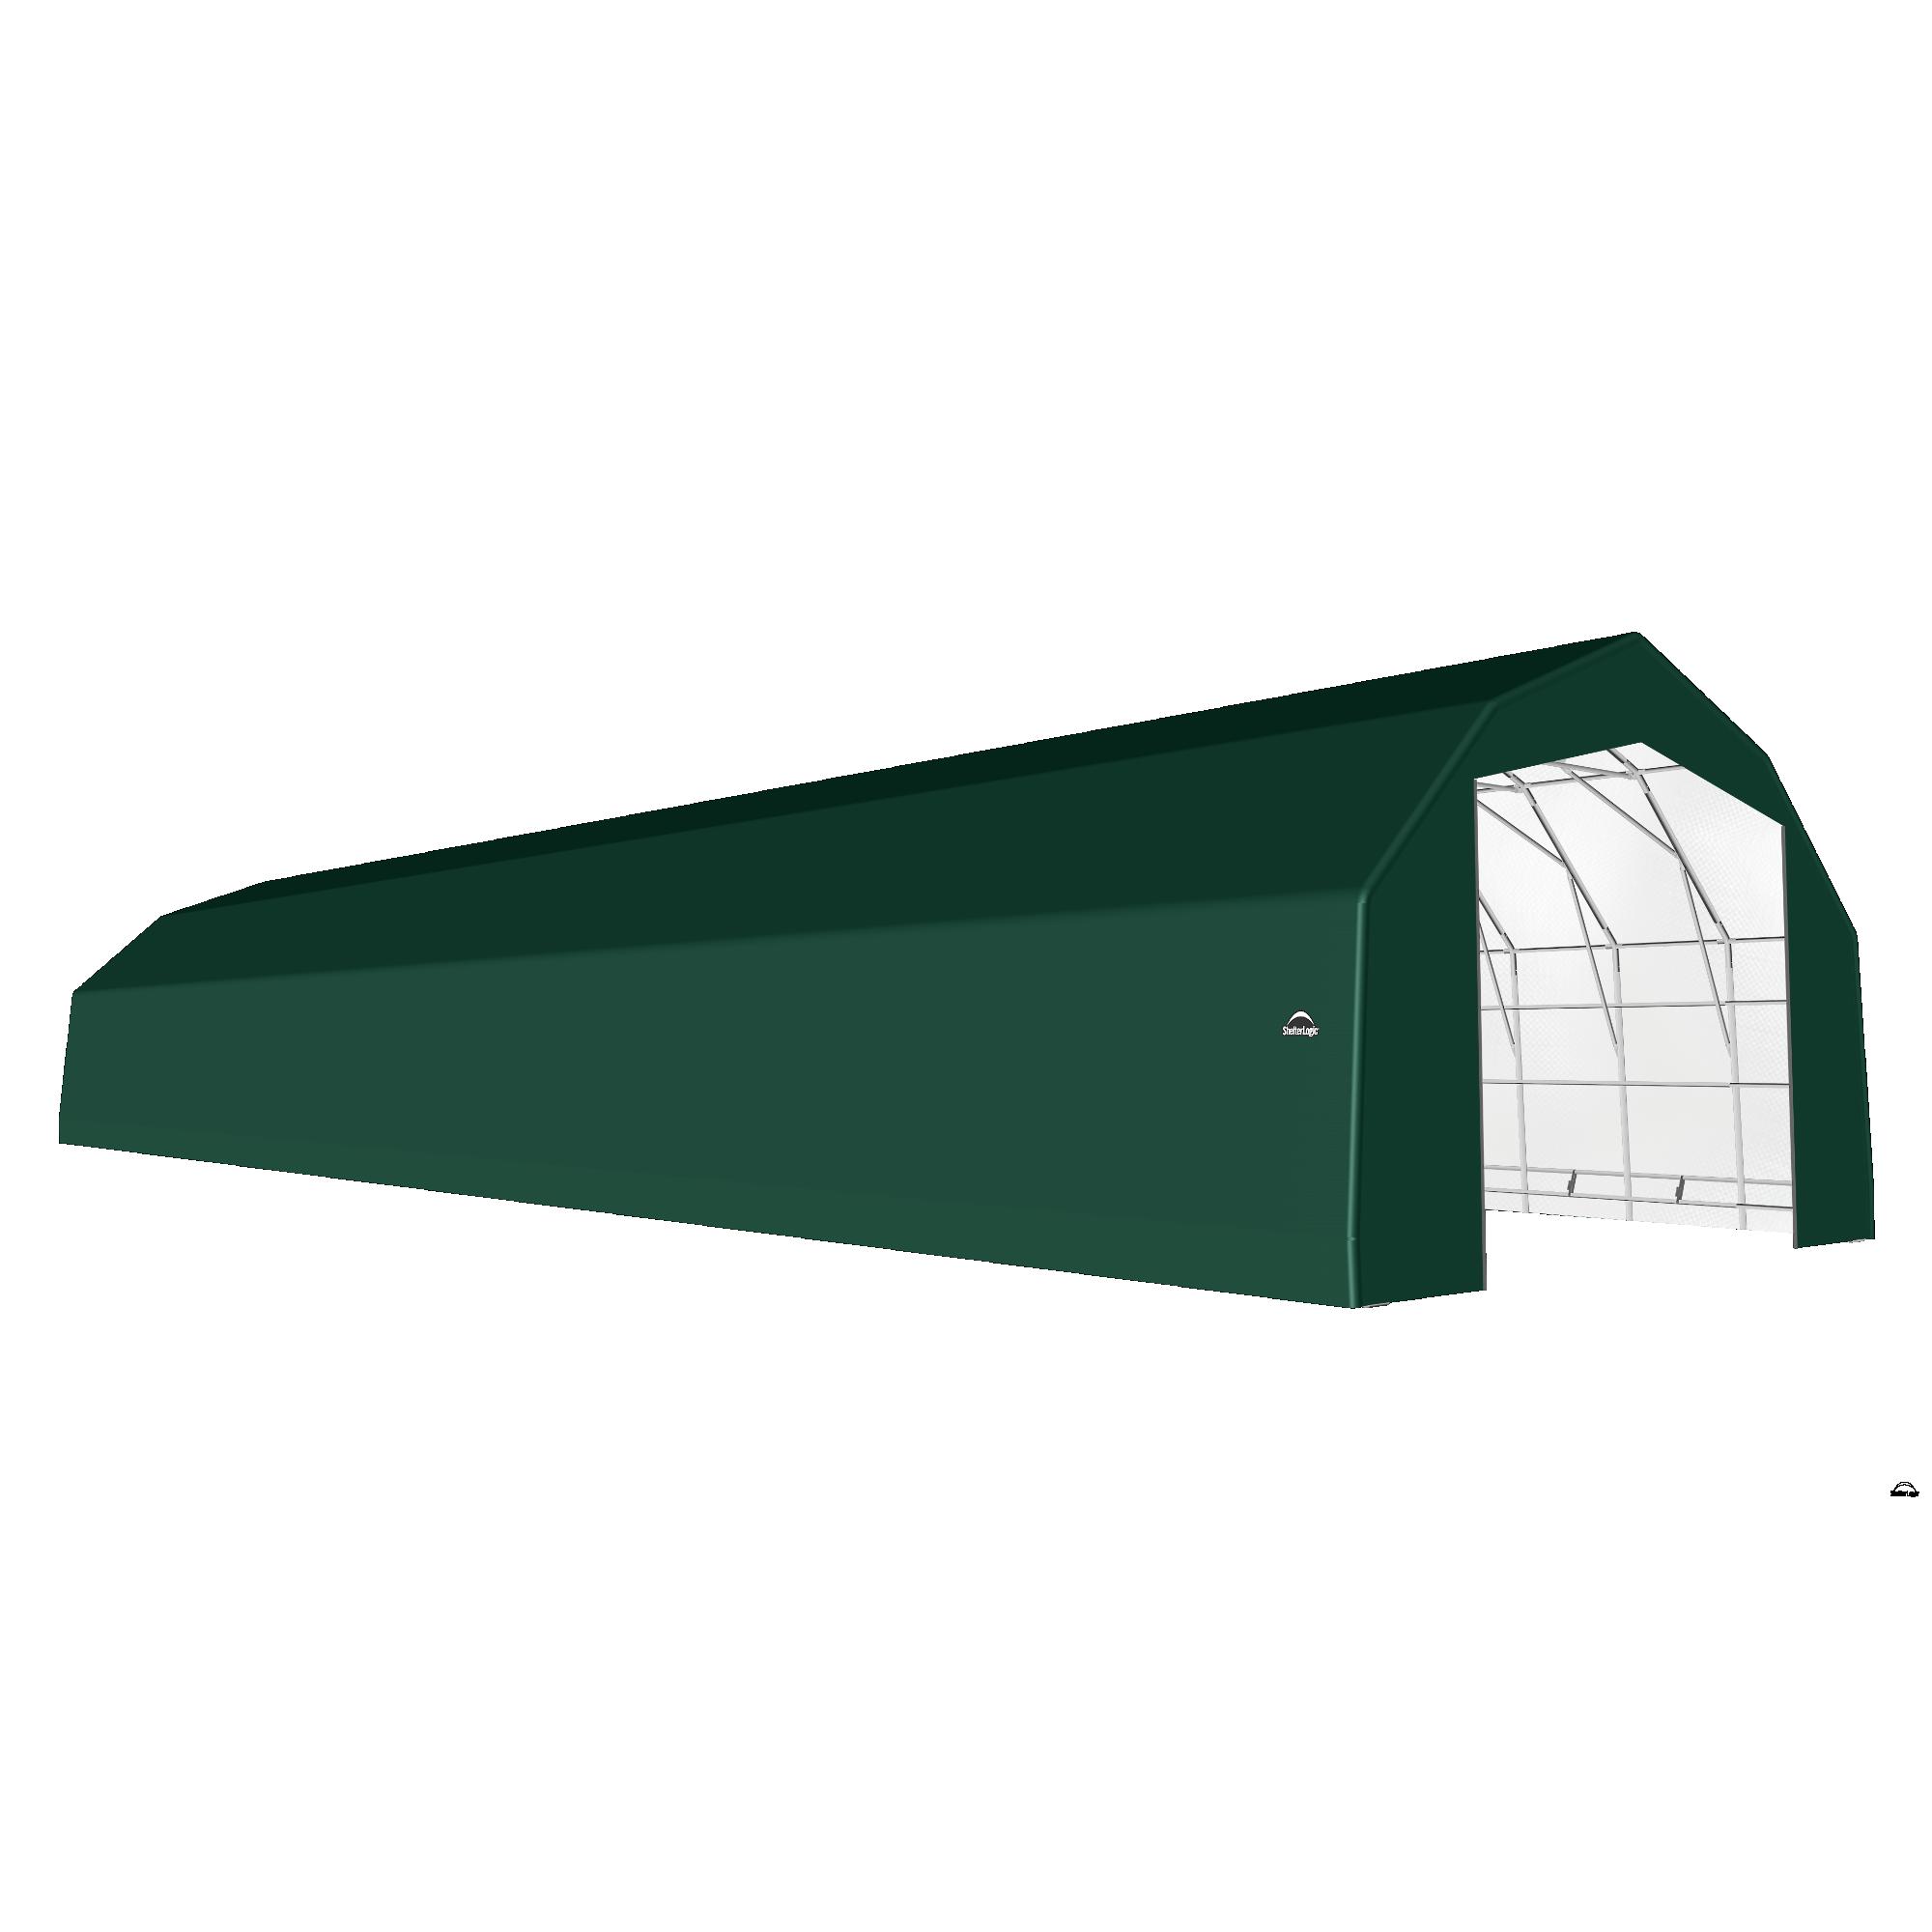 SP Barn 25X100X17 Green 14 oz PE Shelter